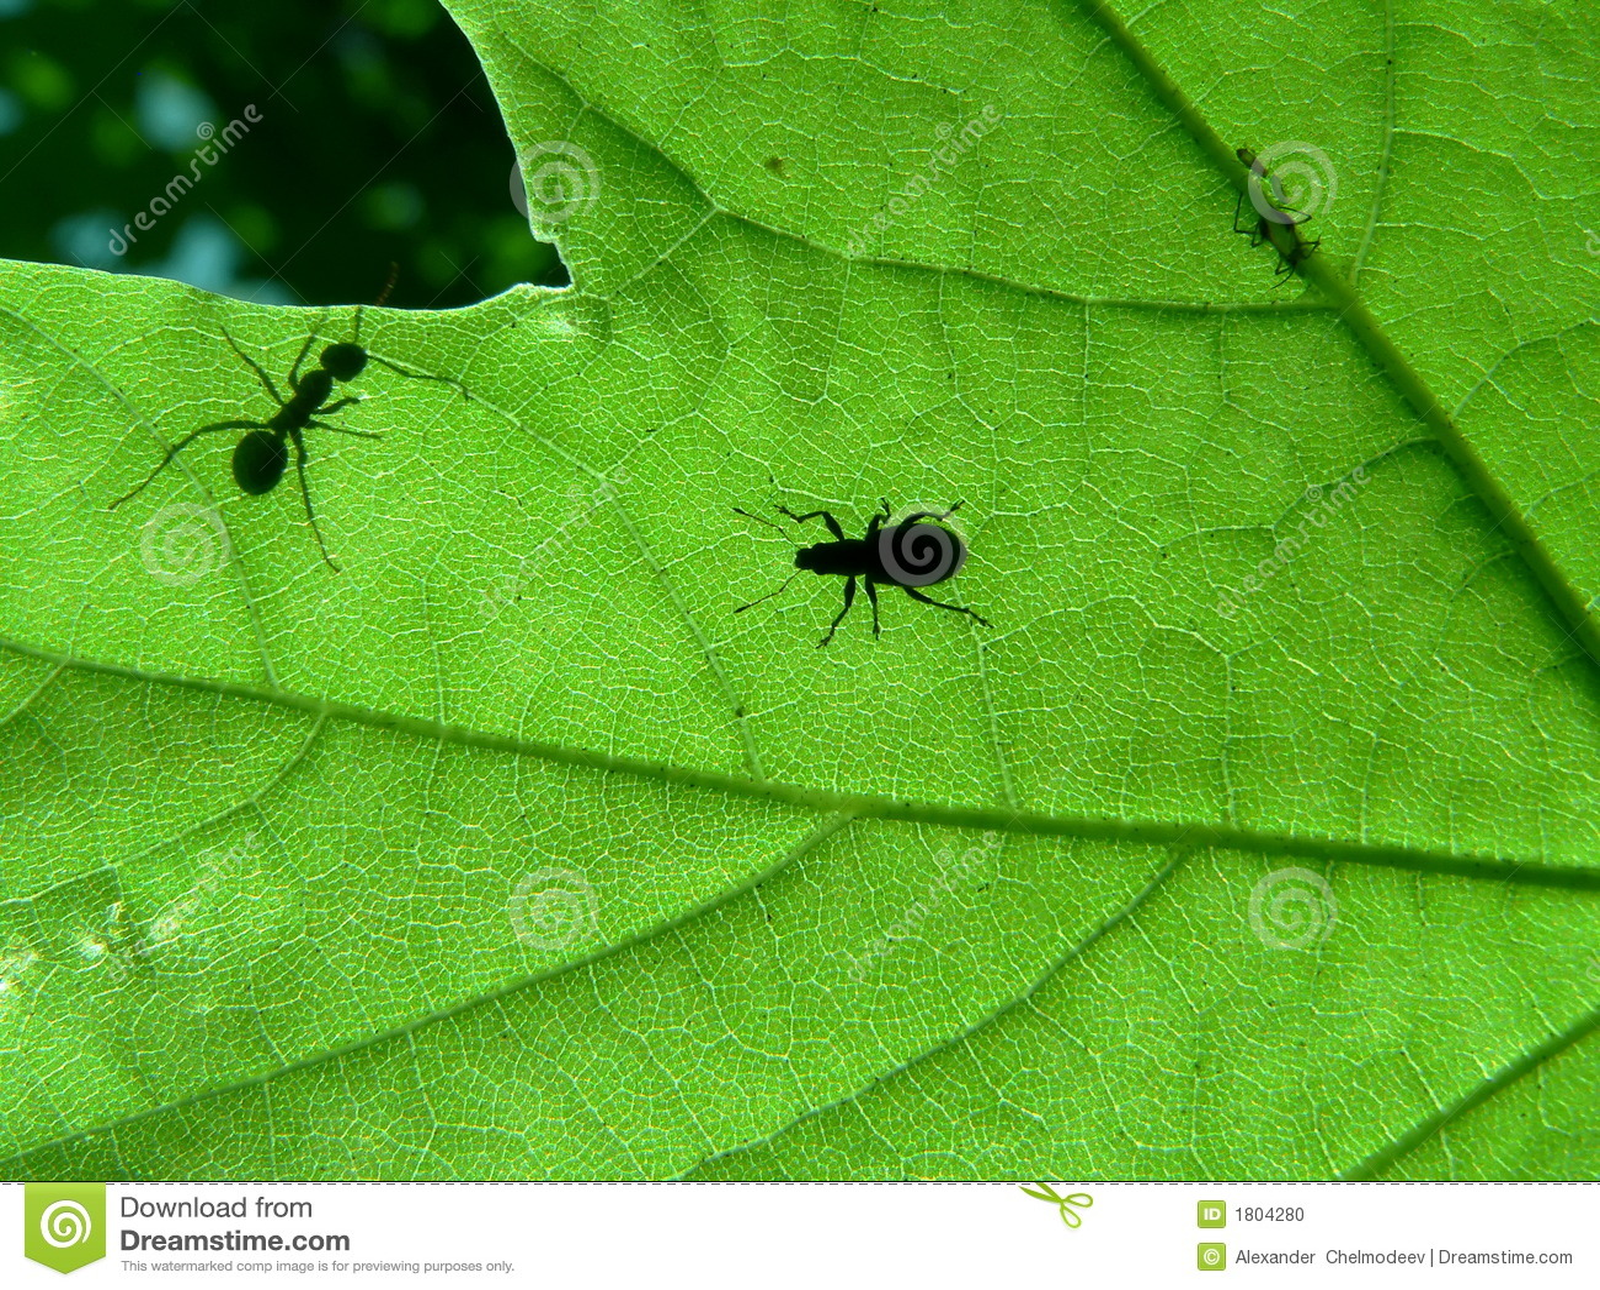 Lame et fourmi